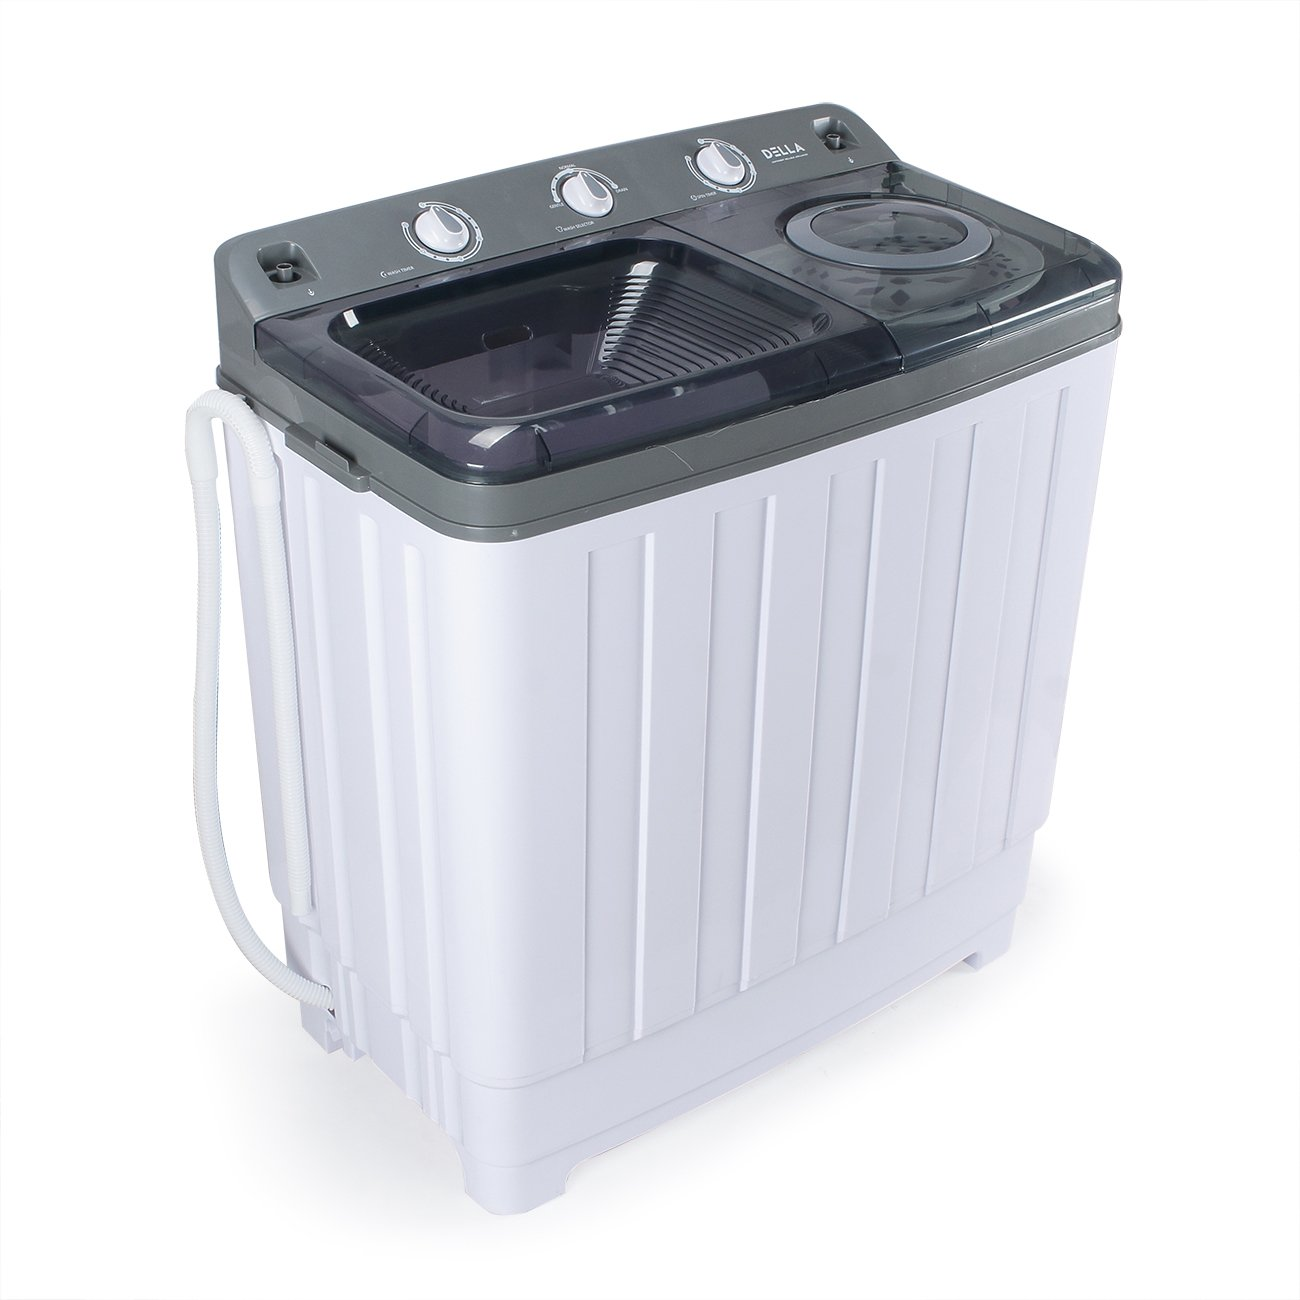 DELLA | Portable Washing Machine | Dual Twin Tub | Spin Dry | Built in Pump | 14KG | 30 LBS. Capacity| Dorm | Home | RV | White